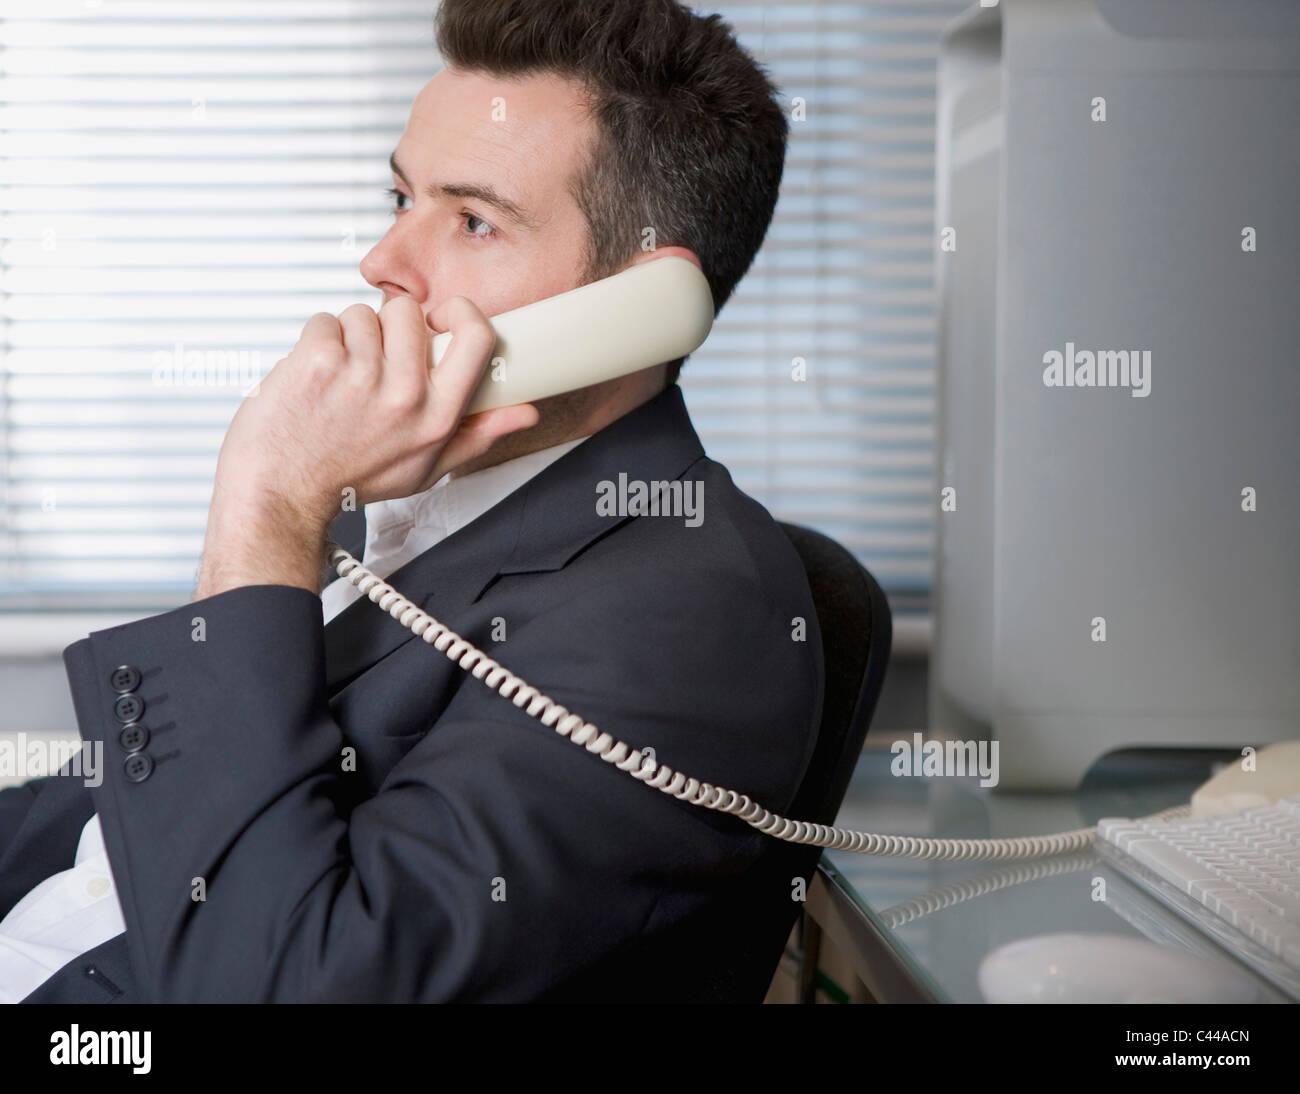 A businessman talking on a landline phone - Stock Image